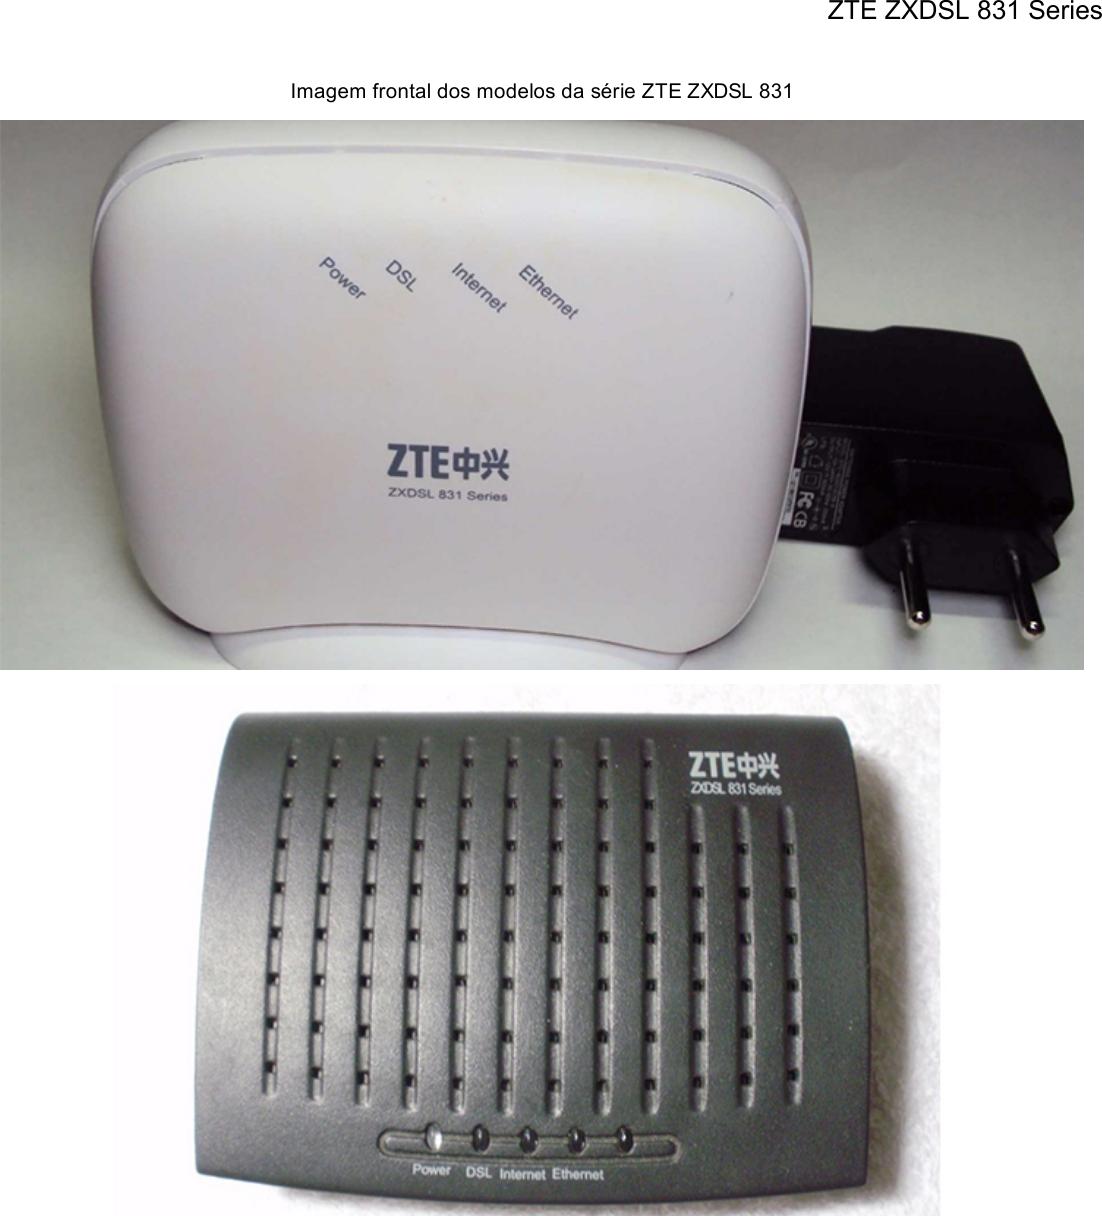 MODEM ZTE ZXDSL 831AII WINDOWS 7 DRIVERS DOWNLOAD (2019)